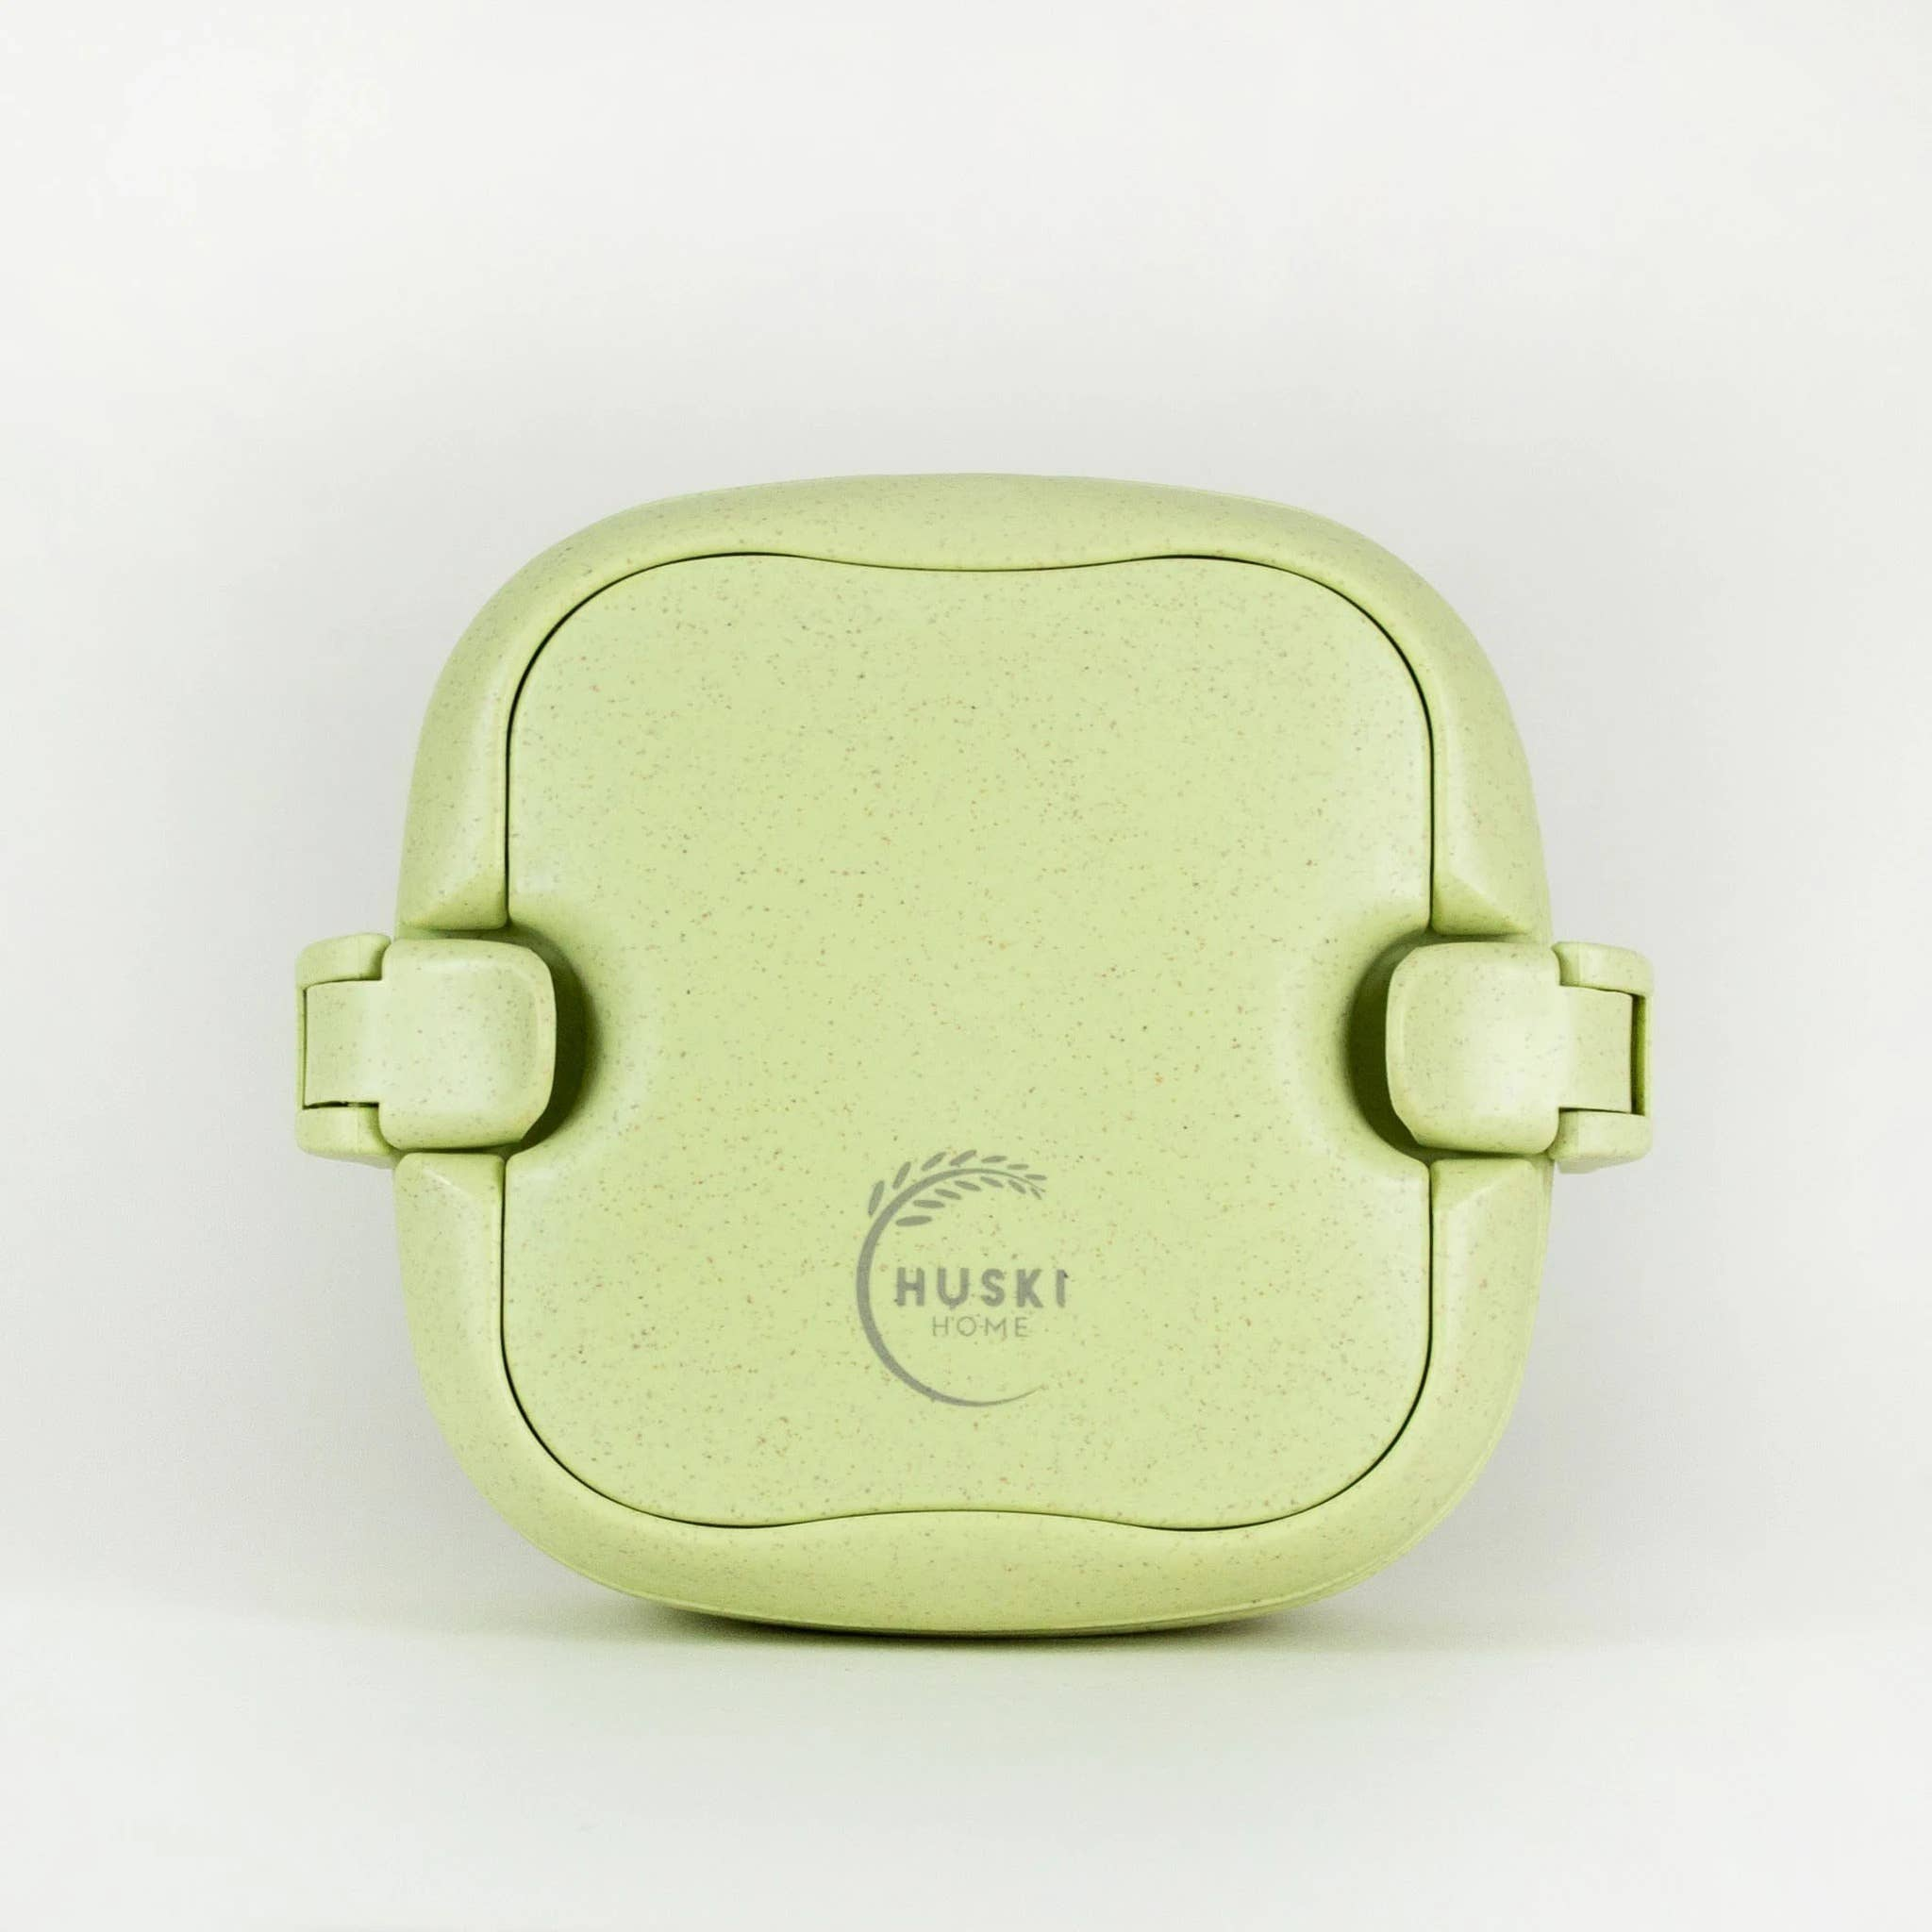 Huski Rice Husk Lunchbox